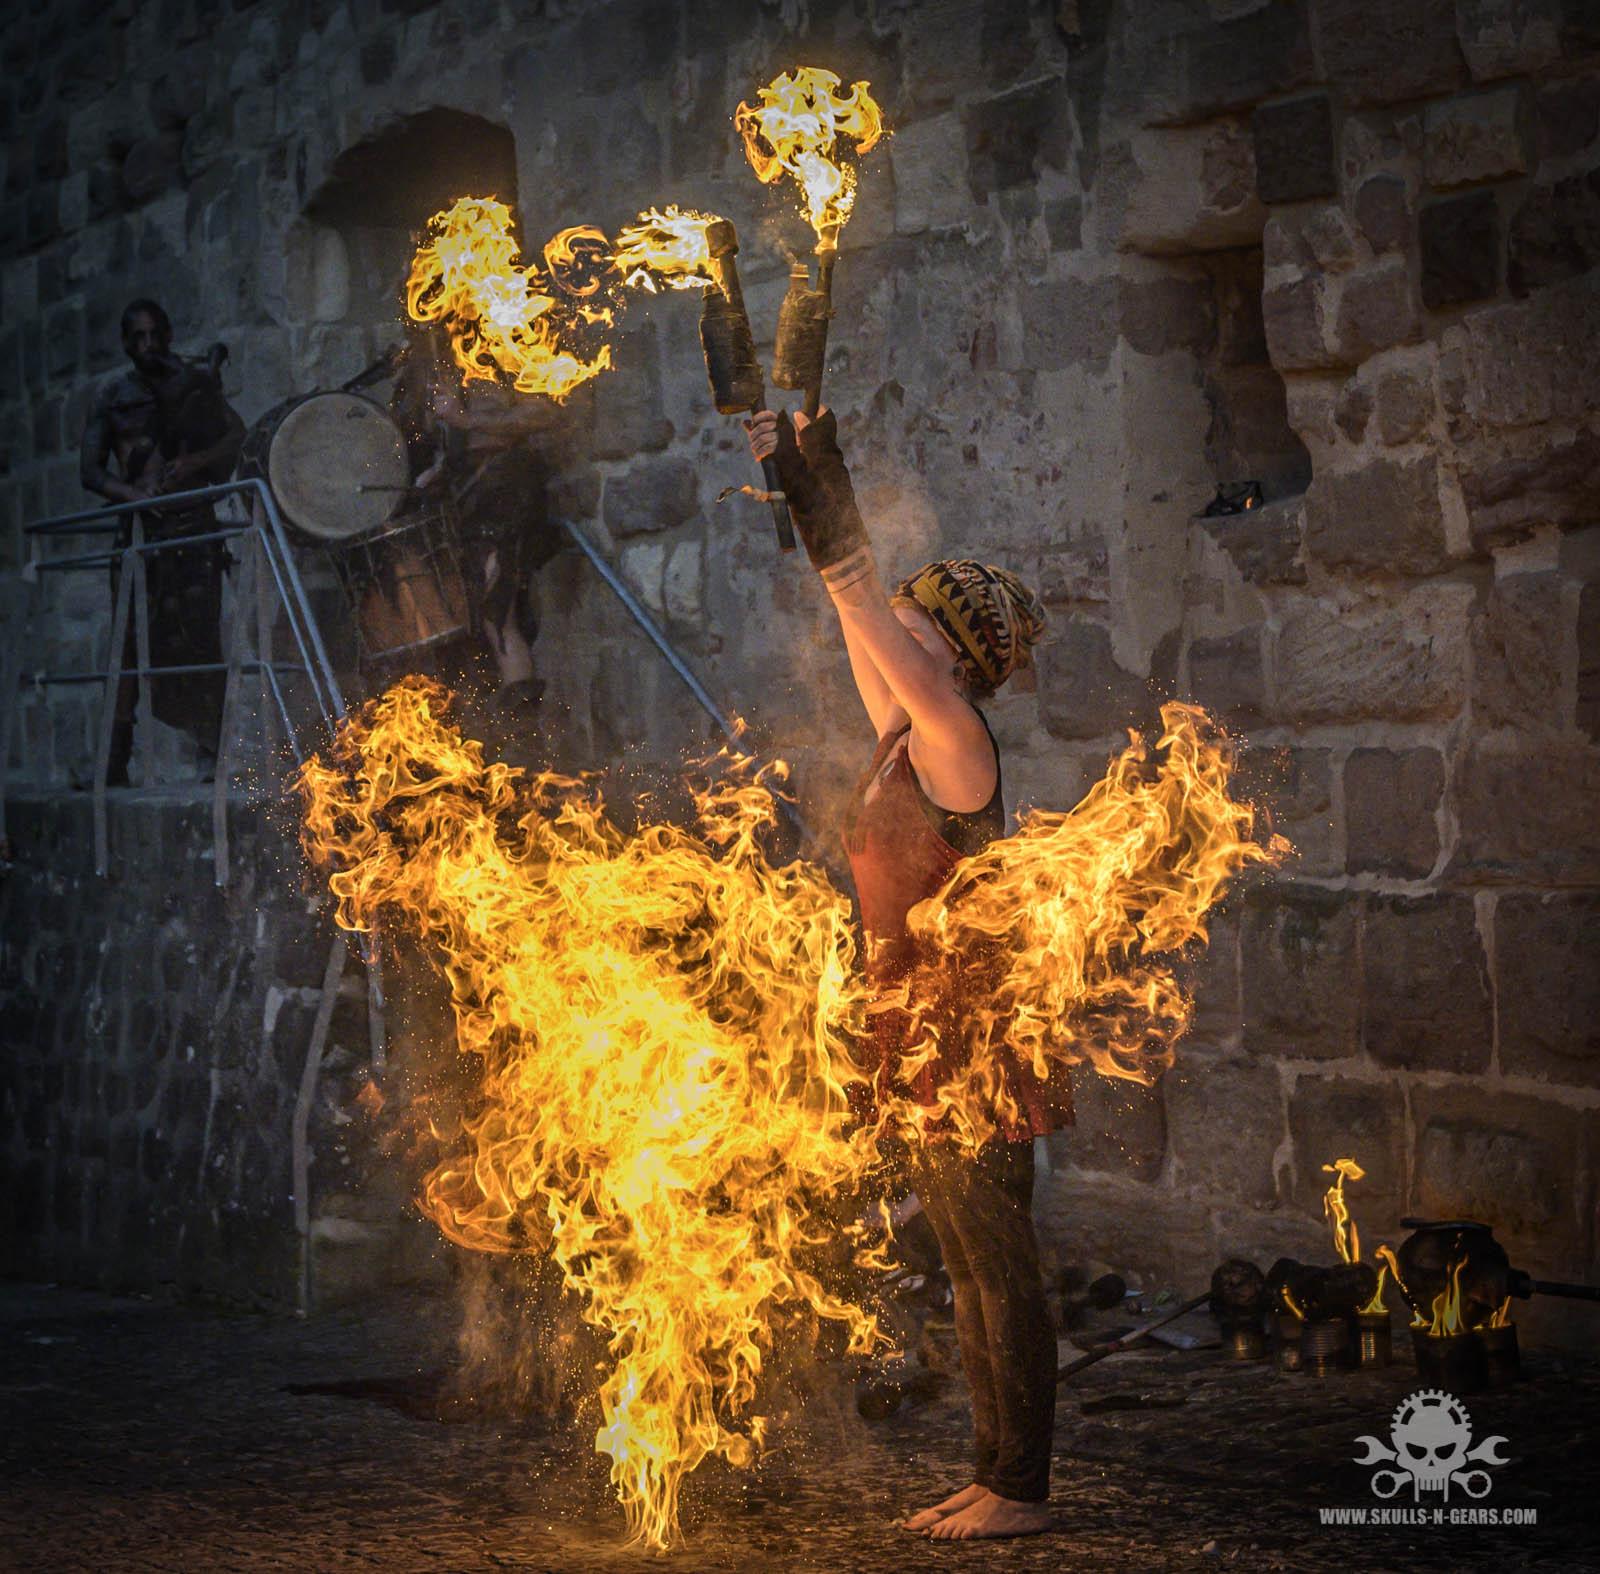 Feuertanz Festival 2019 - Feuershow-1137